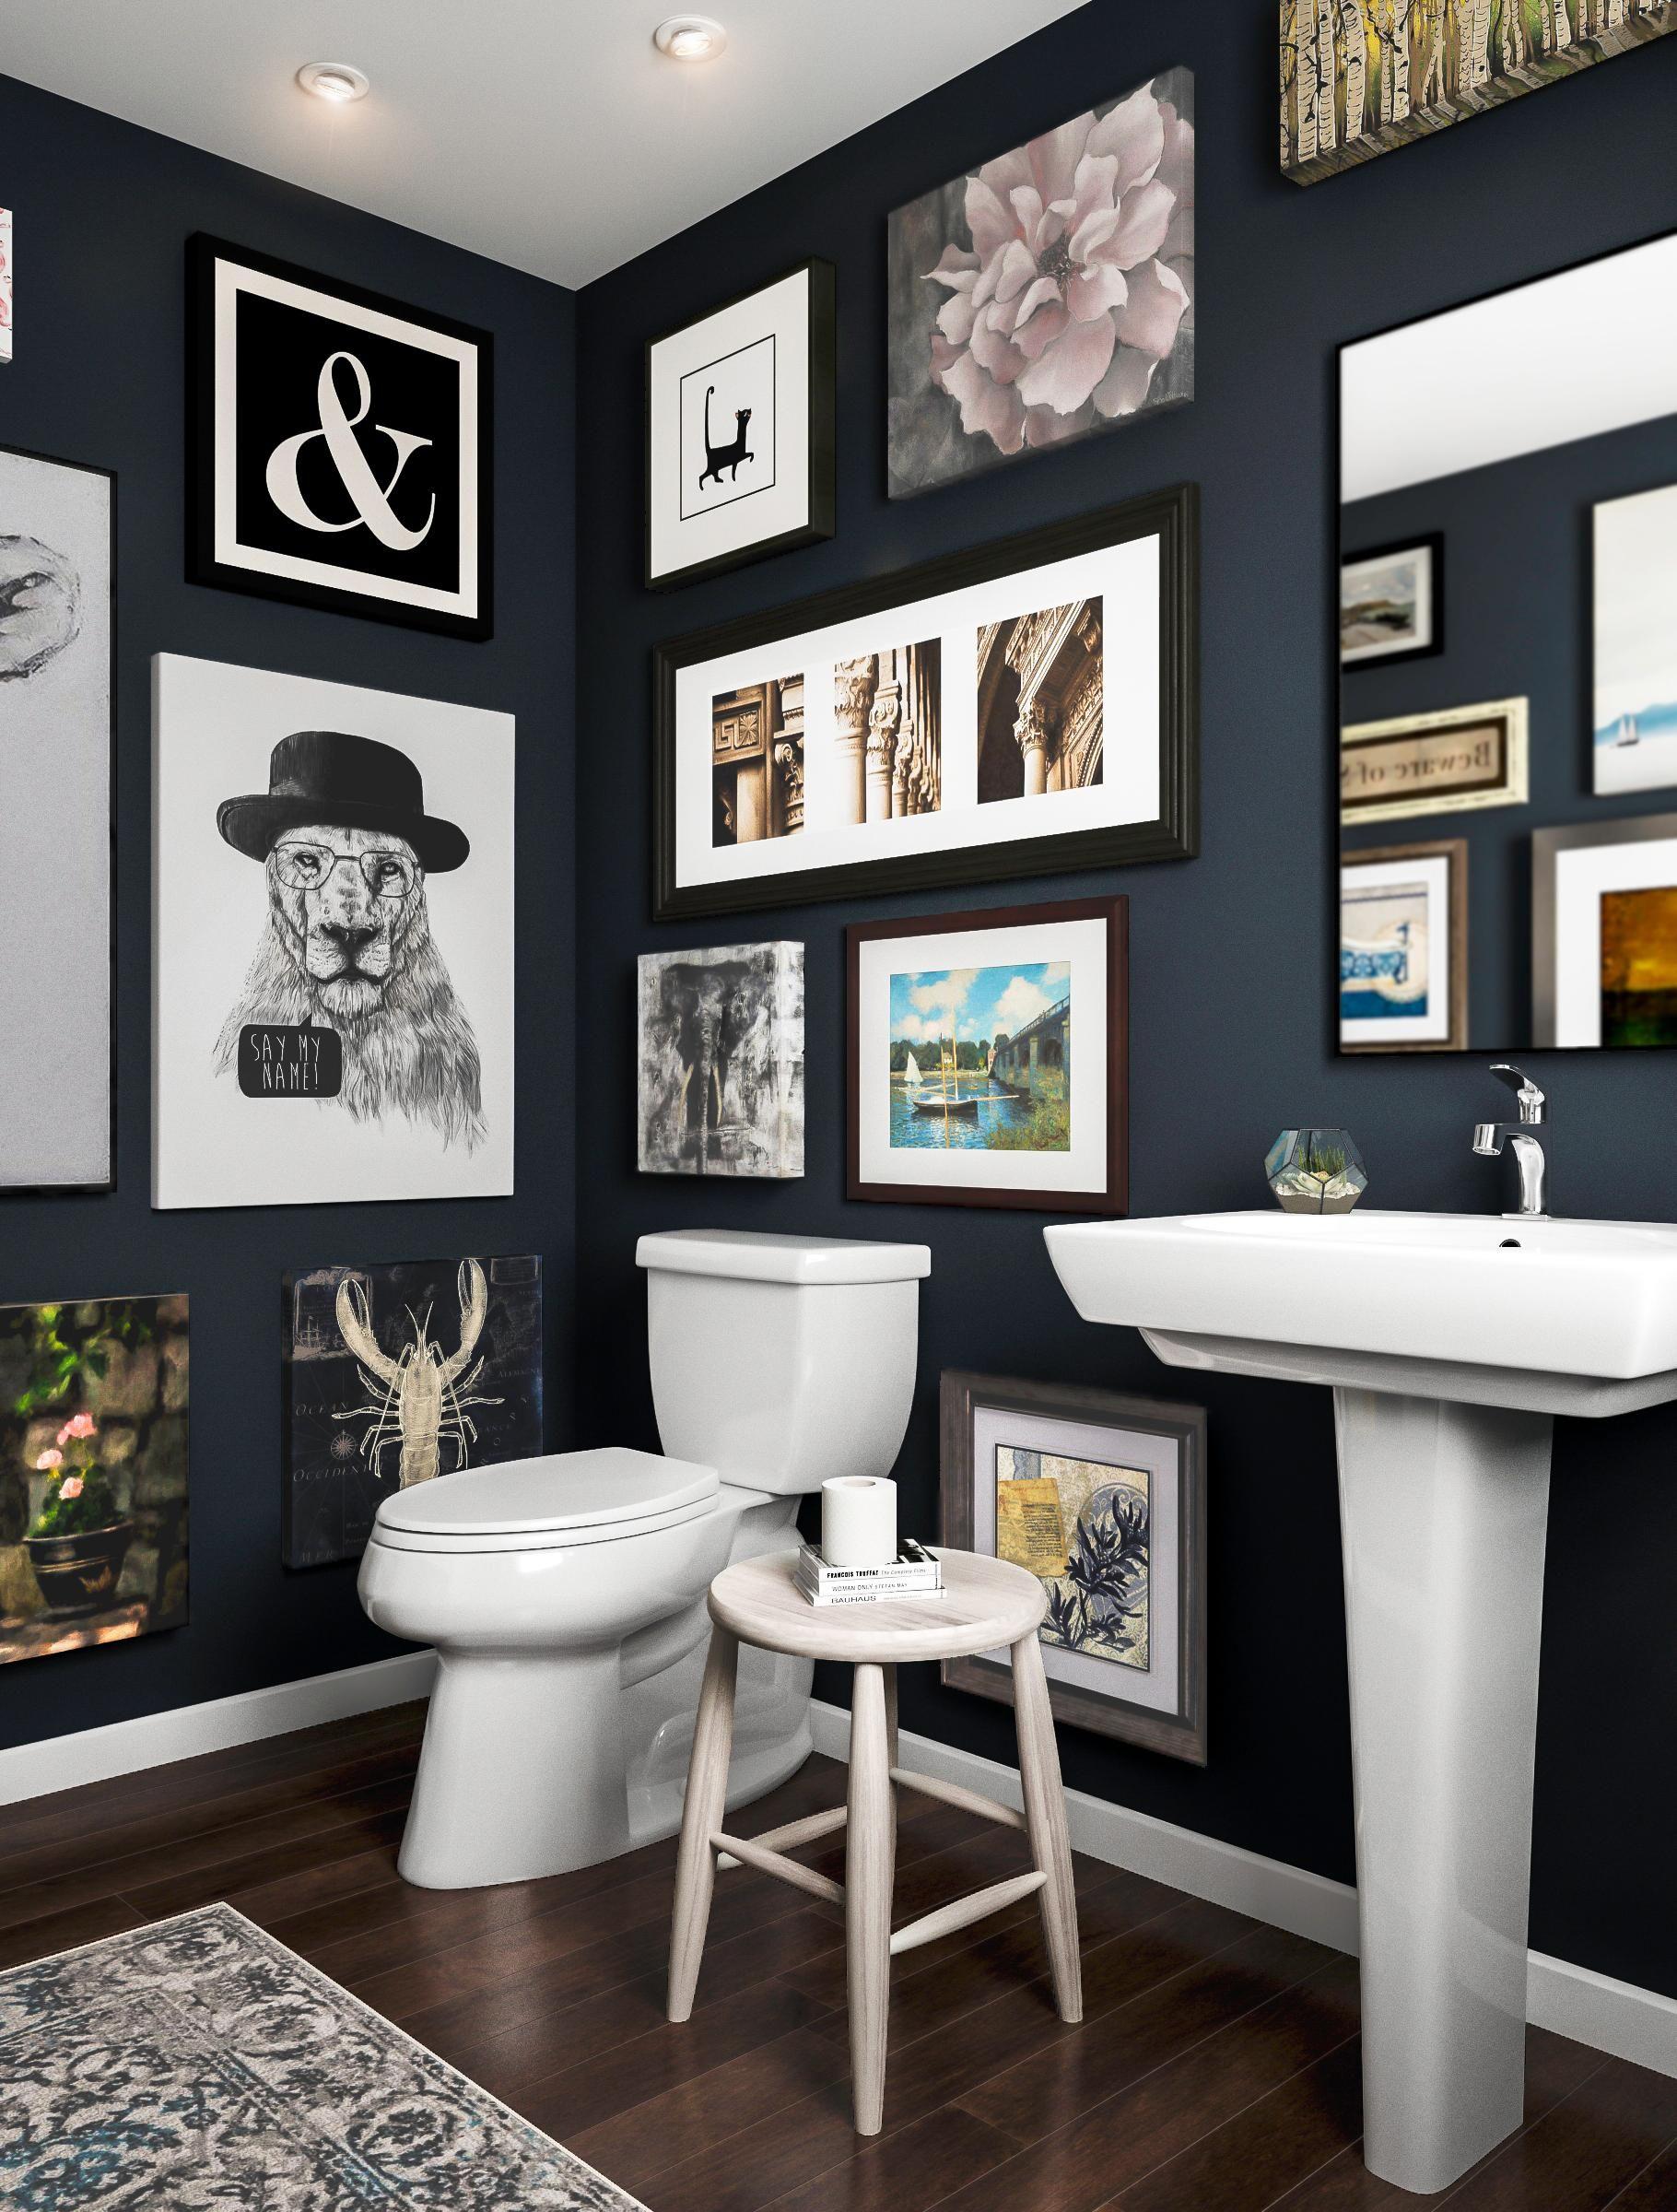 Dark Bathroom With Art Gallery Bathroom Gallery Wall Bathroom Design Bathroom Design Gallery